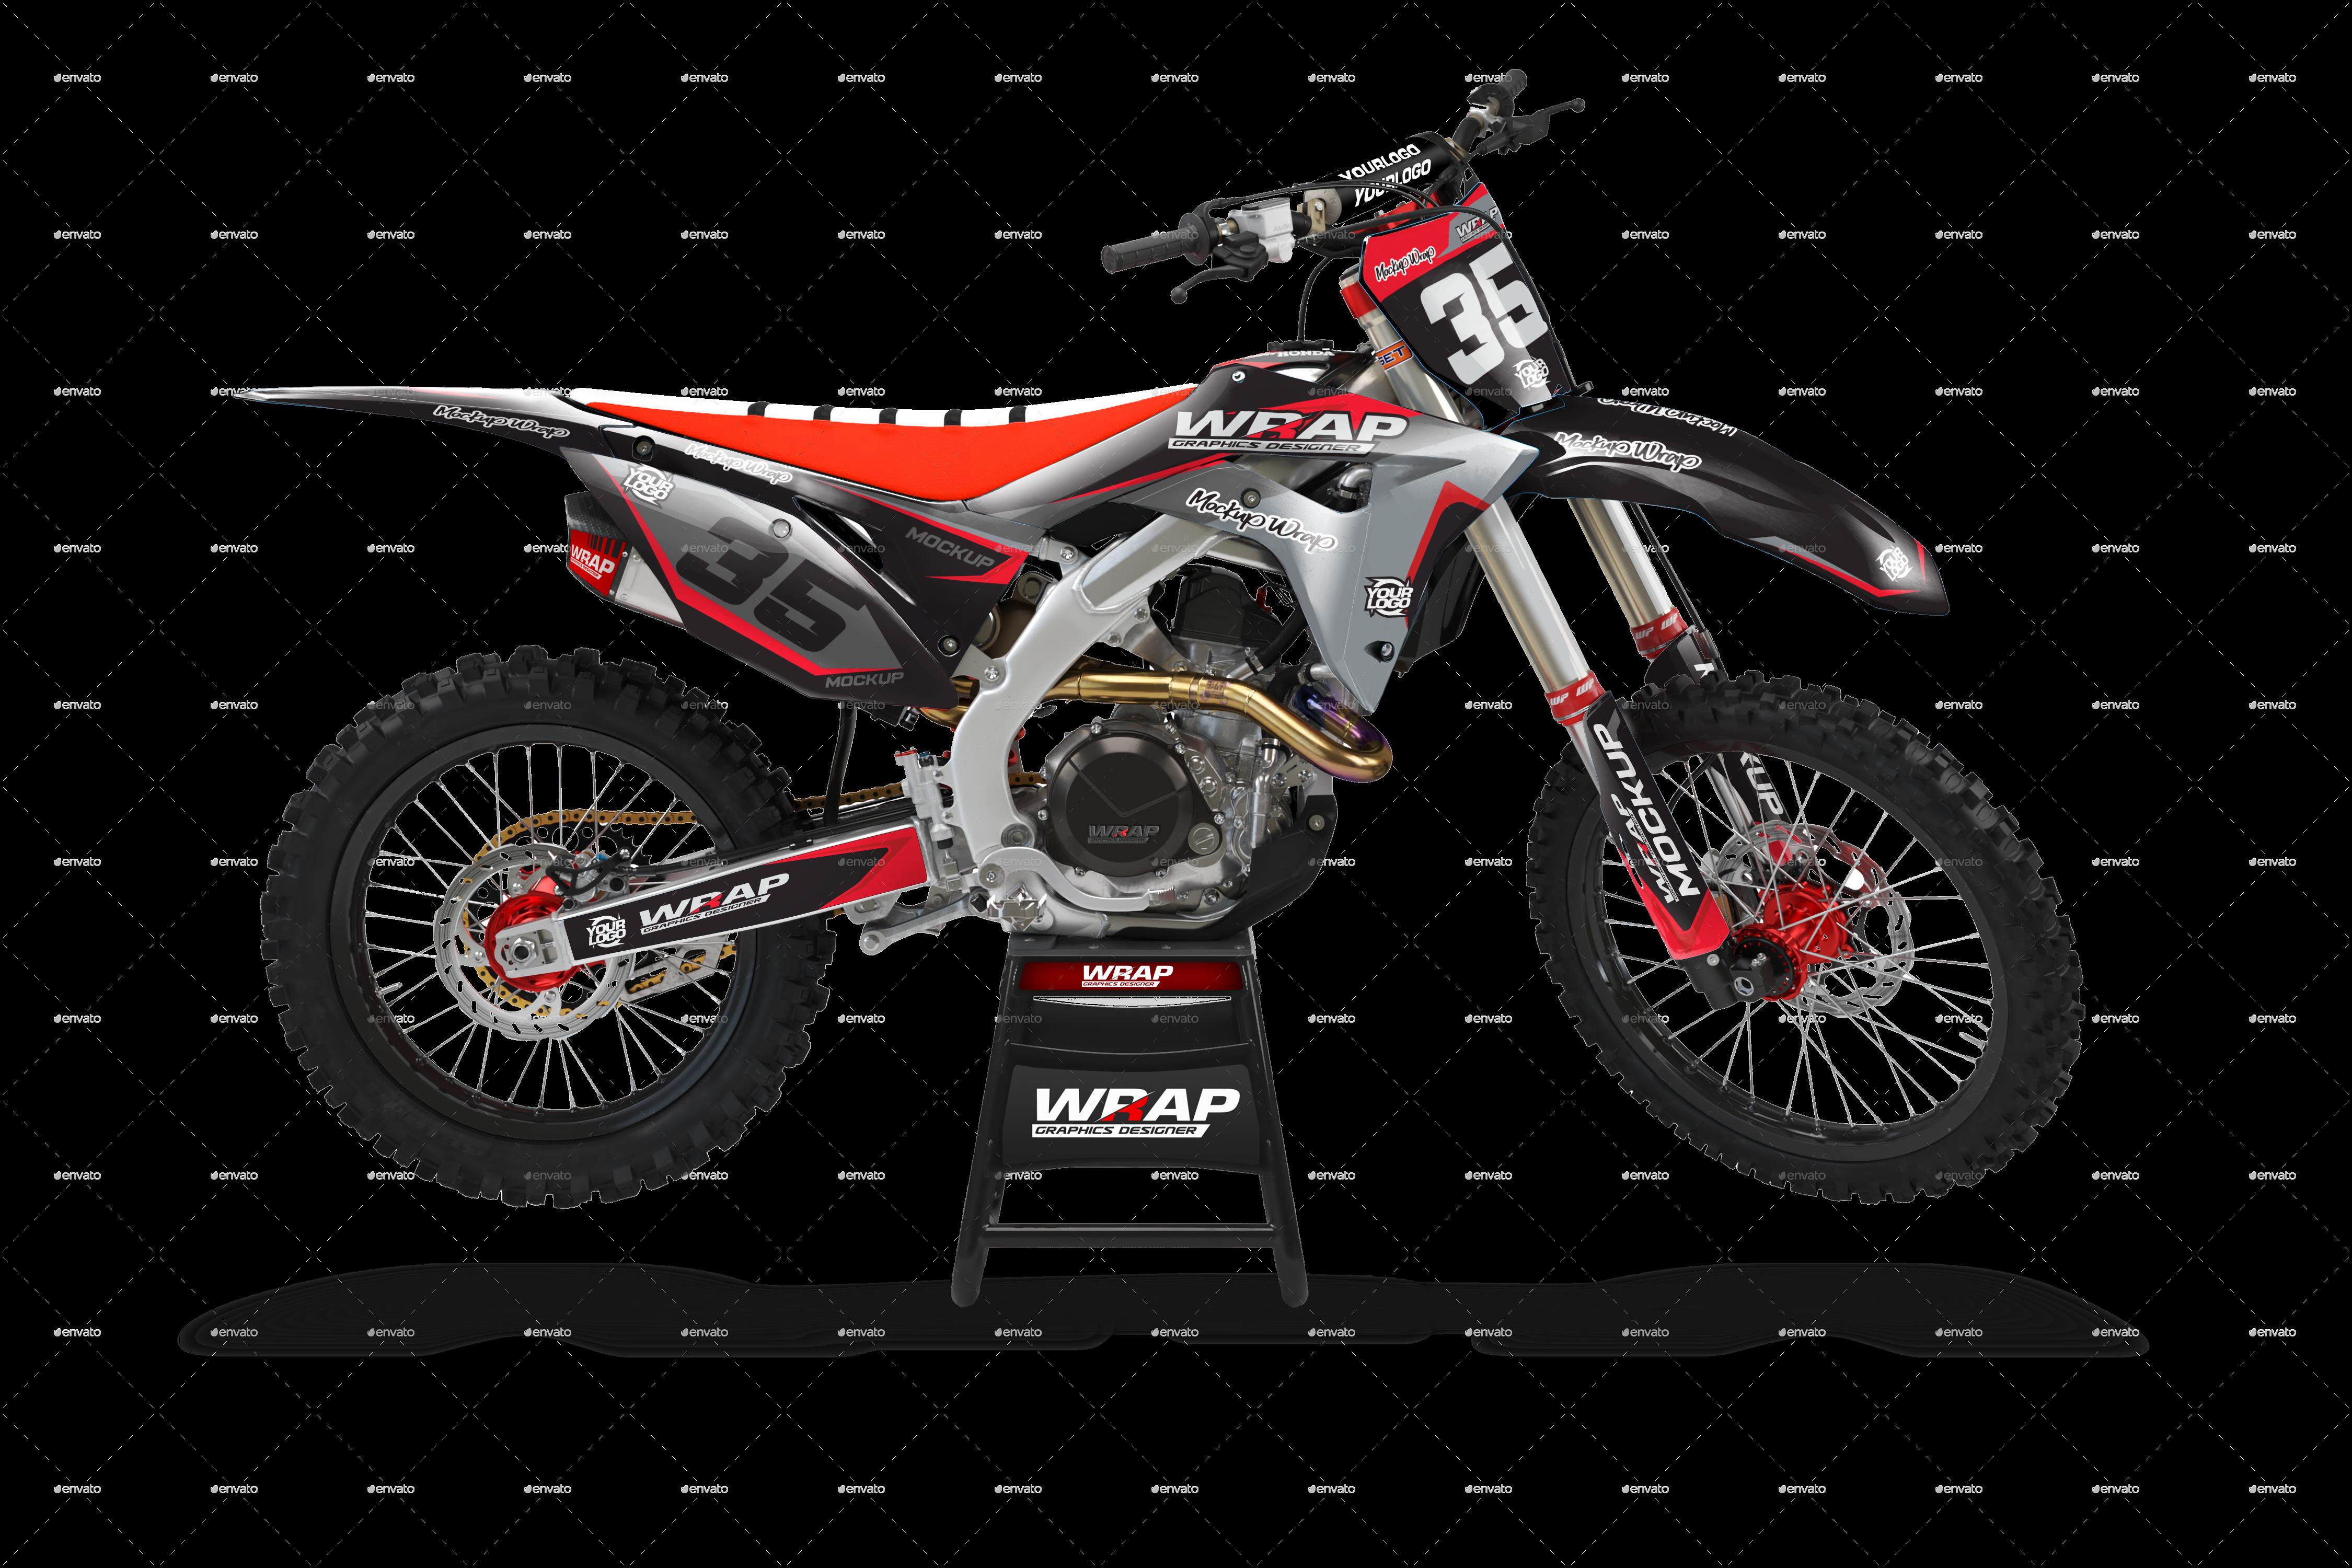 Crf 125 450 2020 Motorcycle Mockup In 2021 Mockup Motorcycle Creative Resume Template Layout